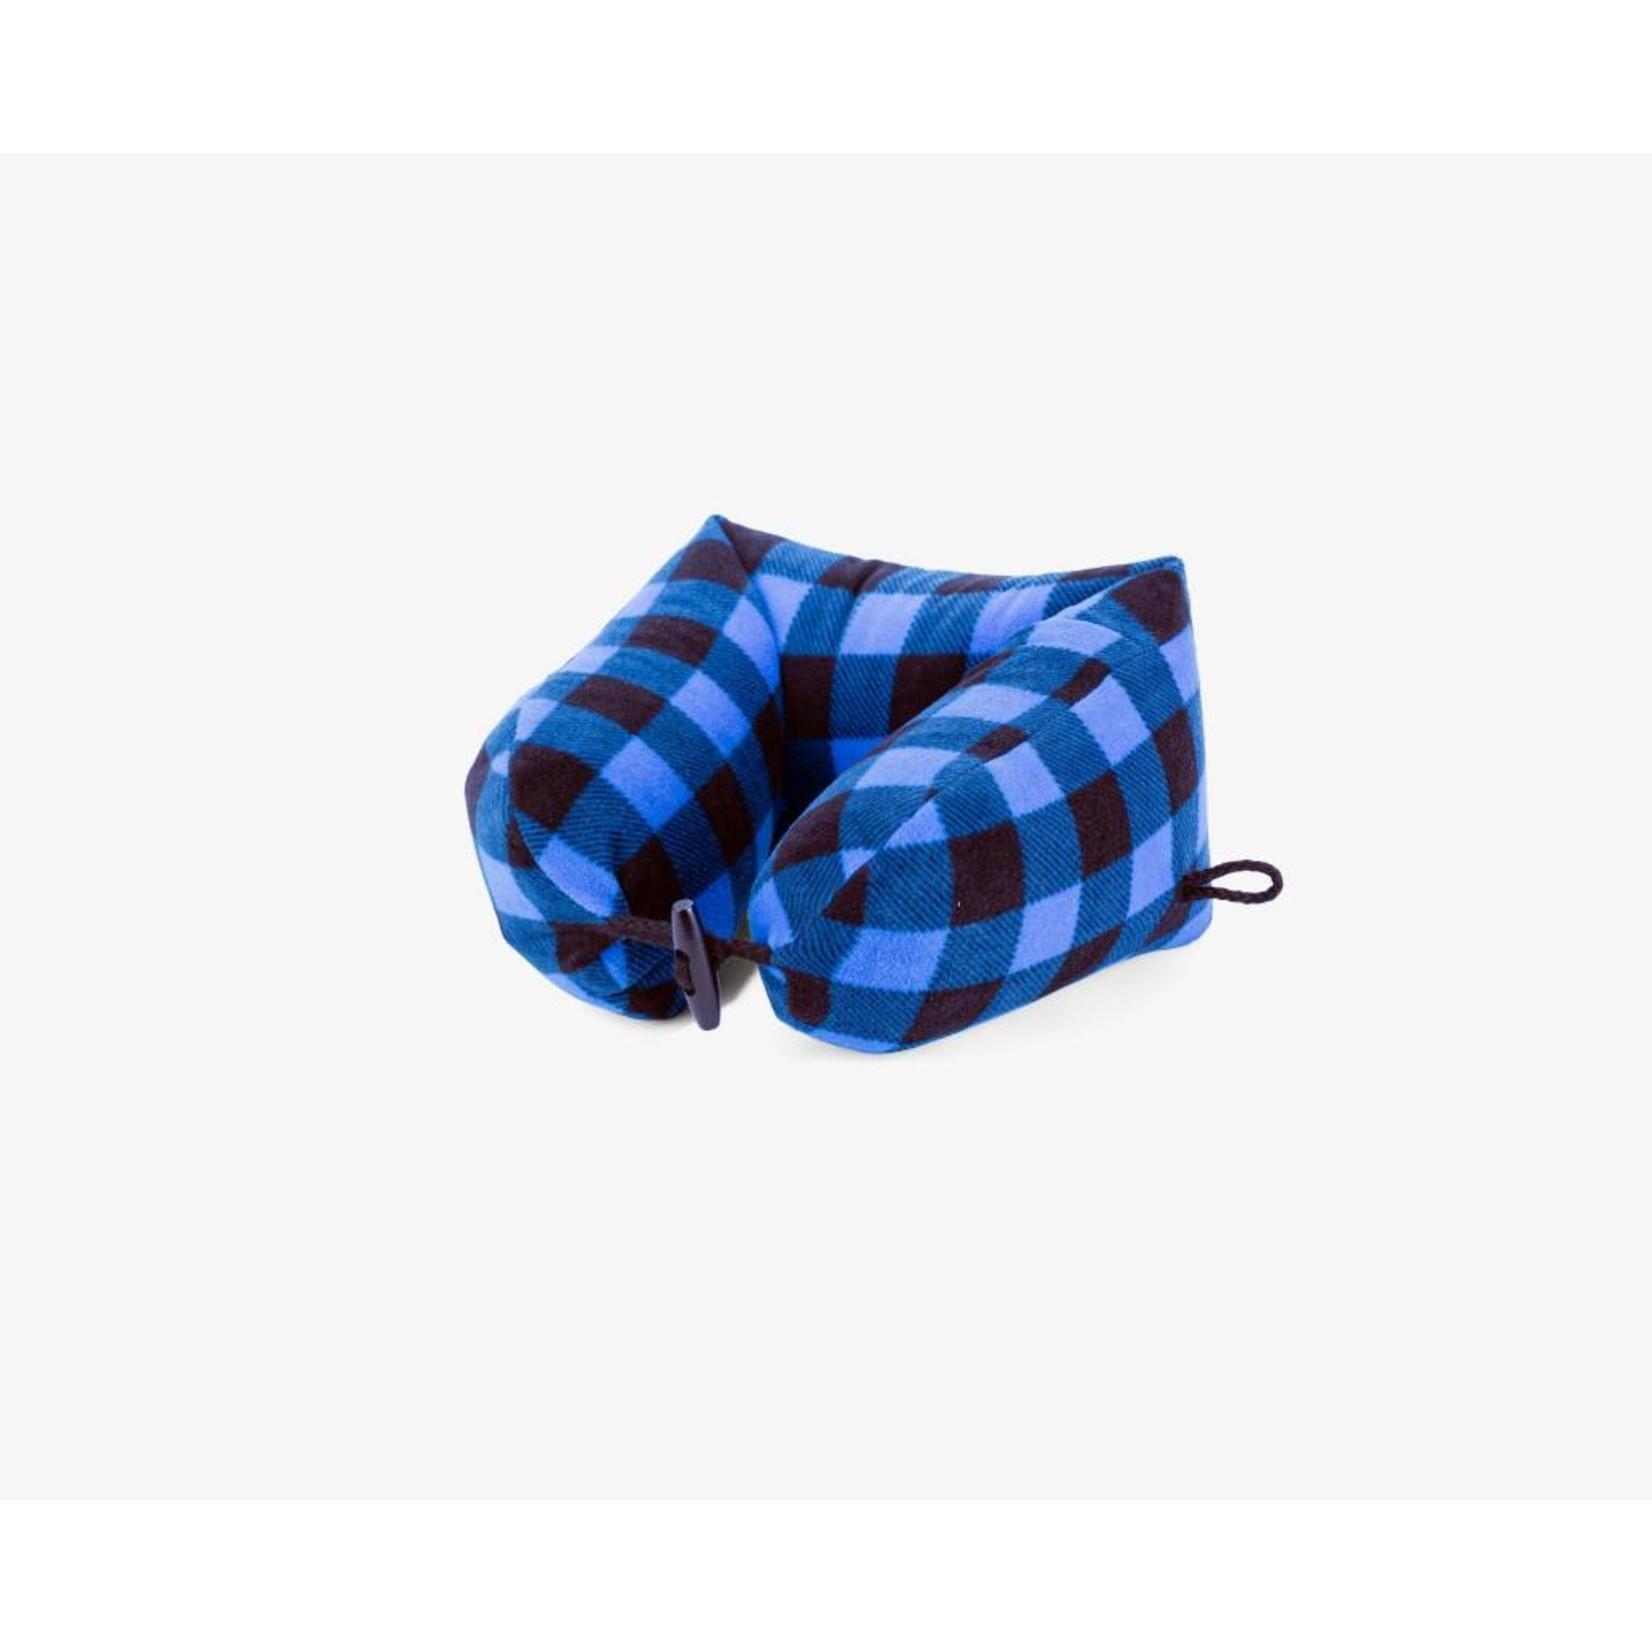 Kikkerland Inflatable Travel Pillow